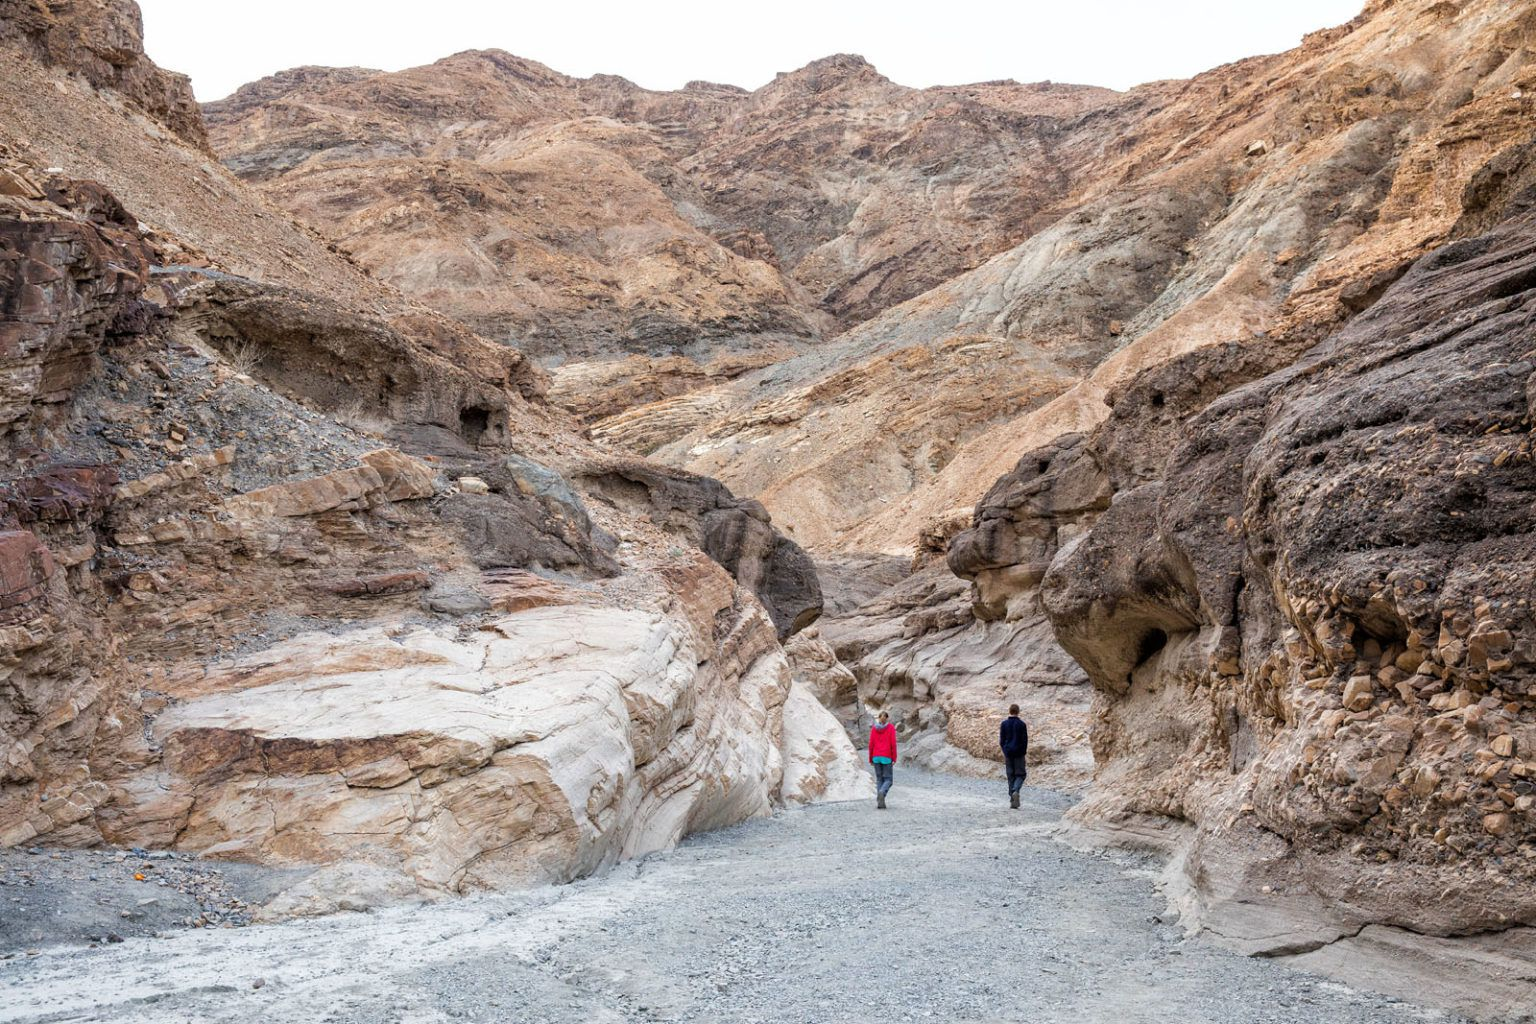 Entering Mosaic Canyon